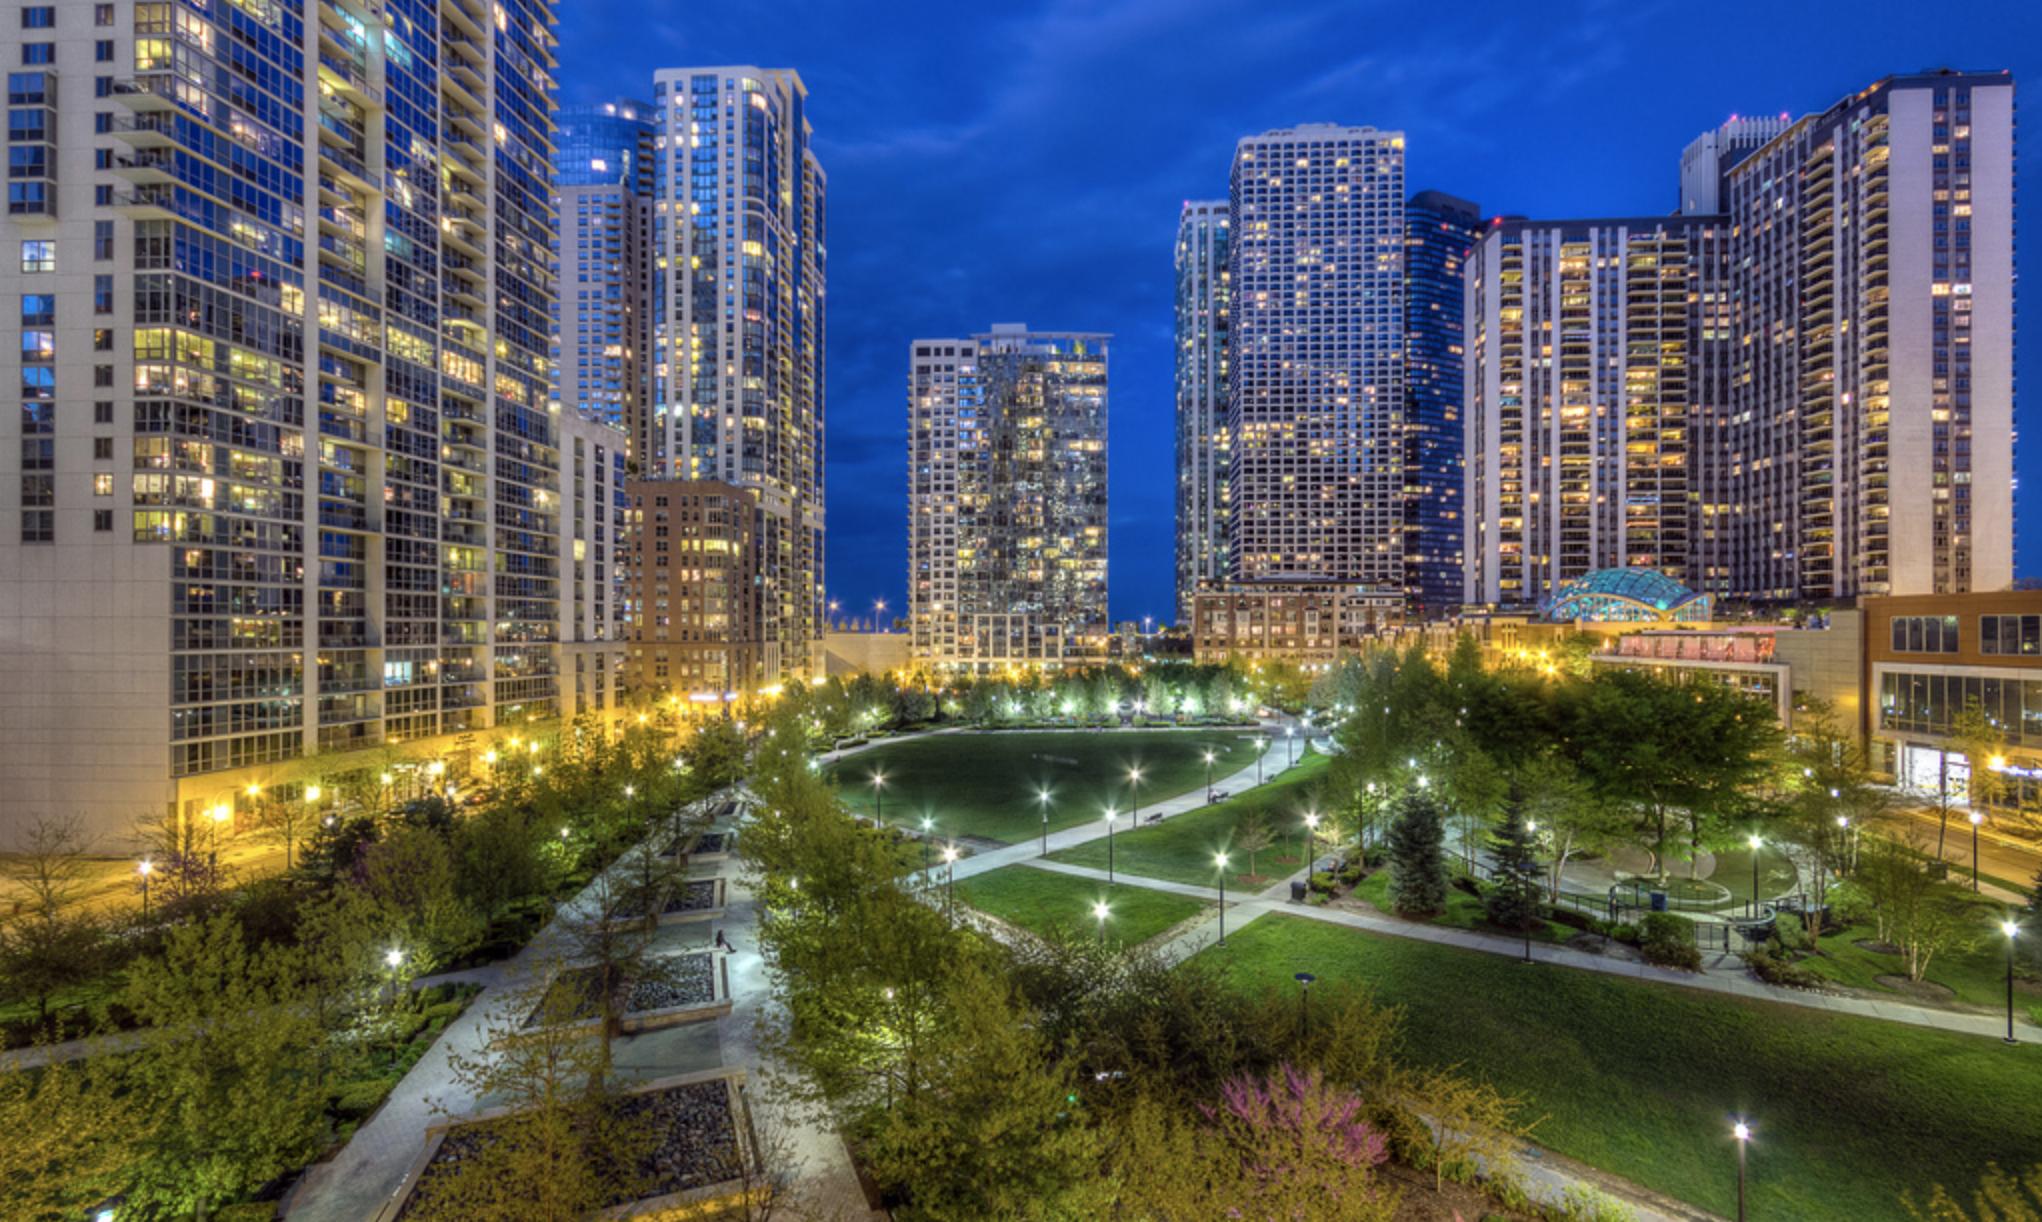 Pilsen Chicago - Curbed Chicago